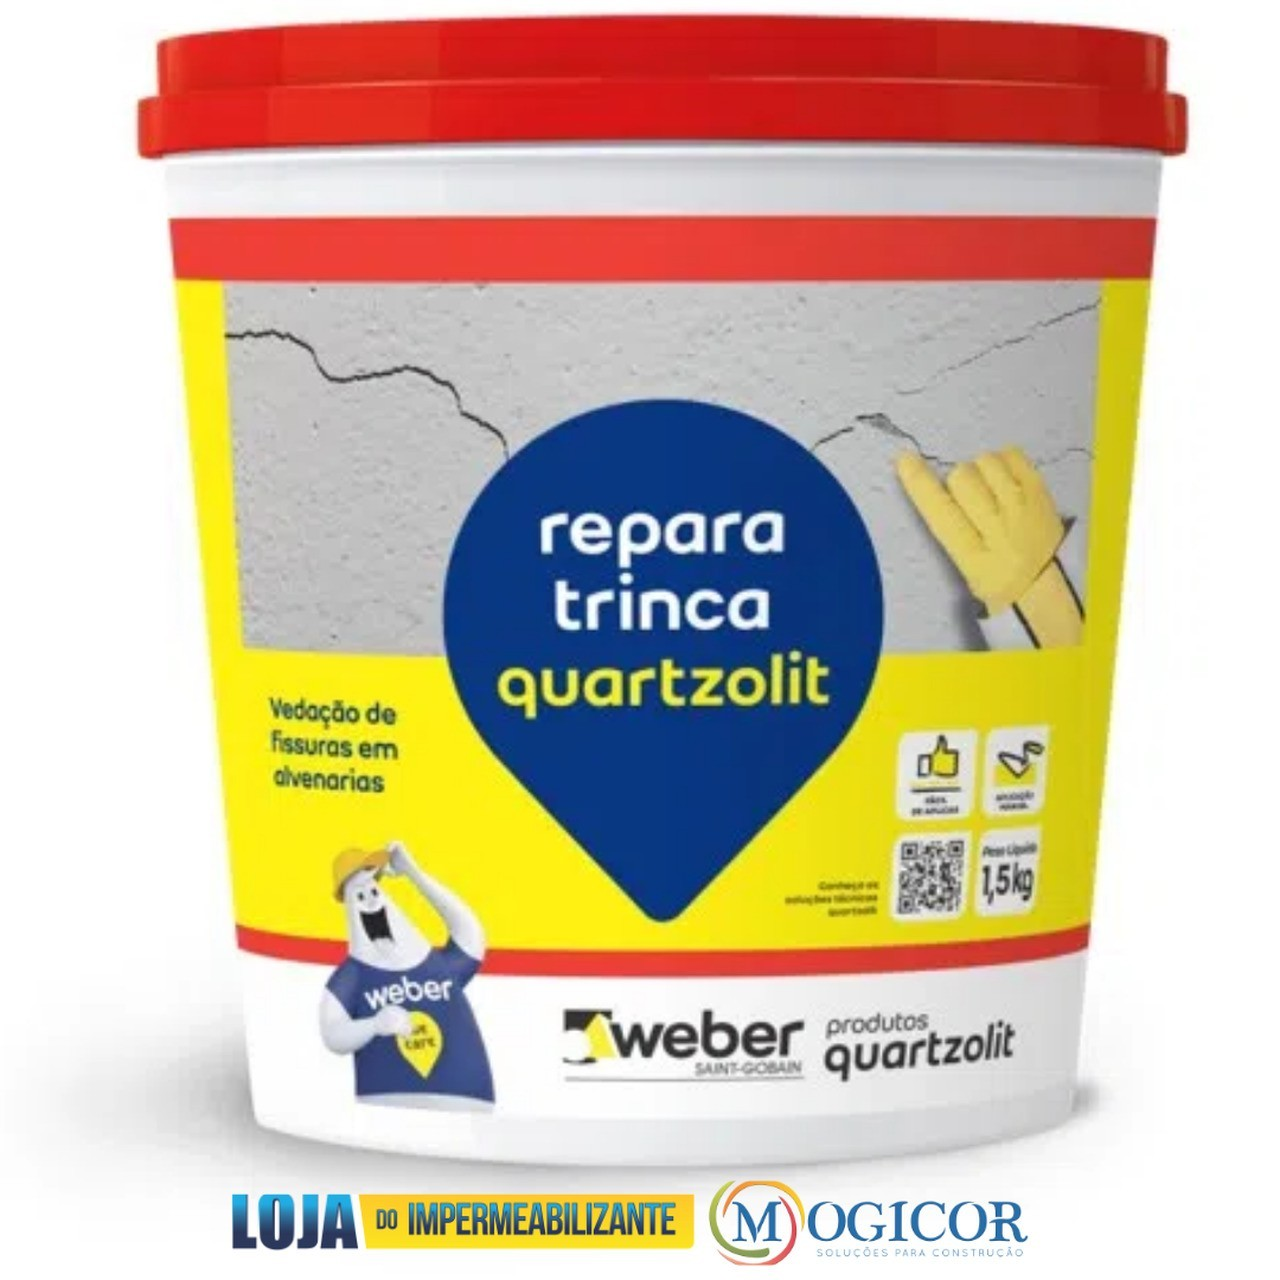 Repara Trinca (Sela Trinca) Frasco 1,5kg - Quartzolit